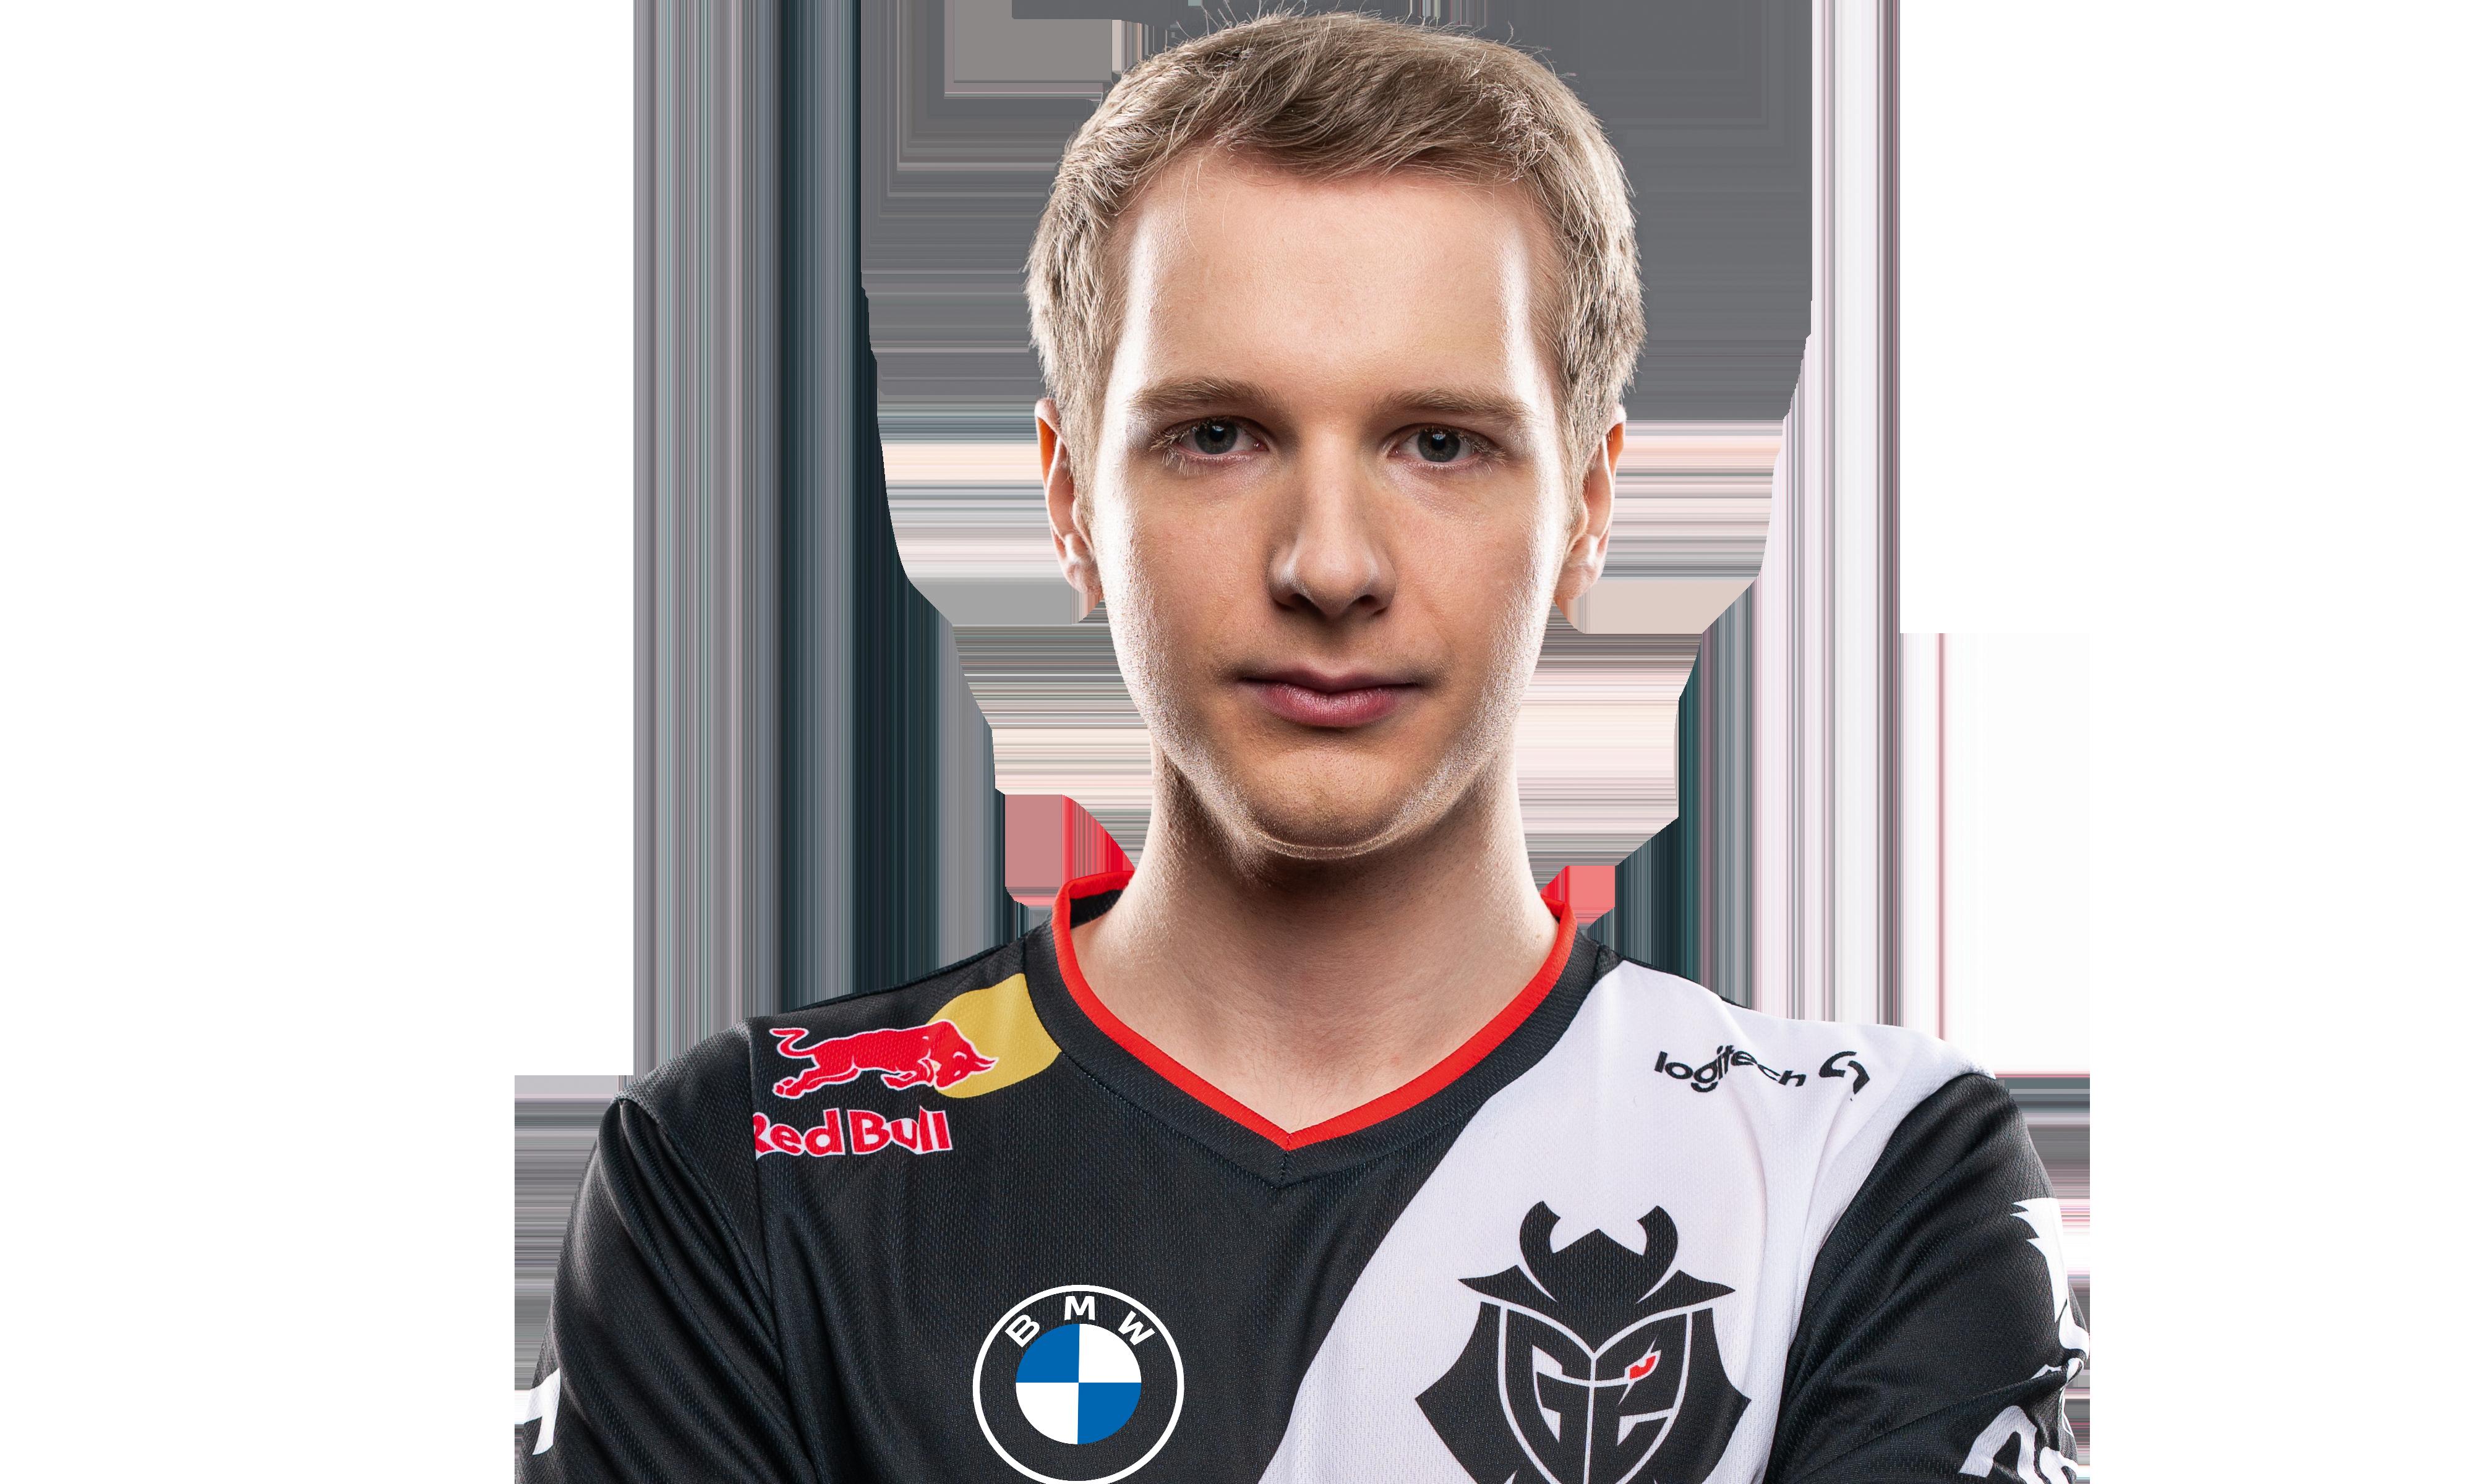 A headshot of G2 Esports League of Legends player Jankos